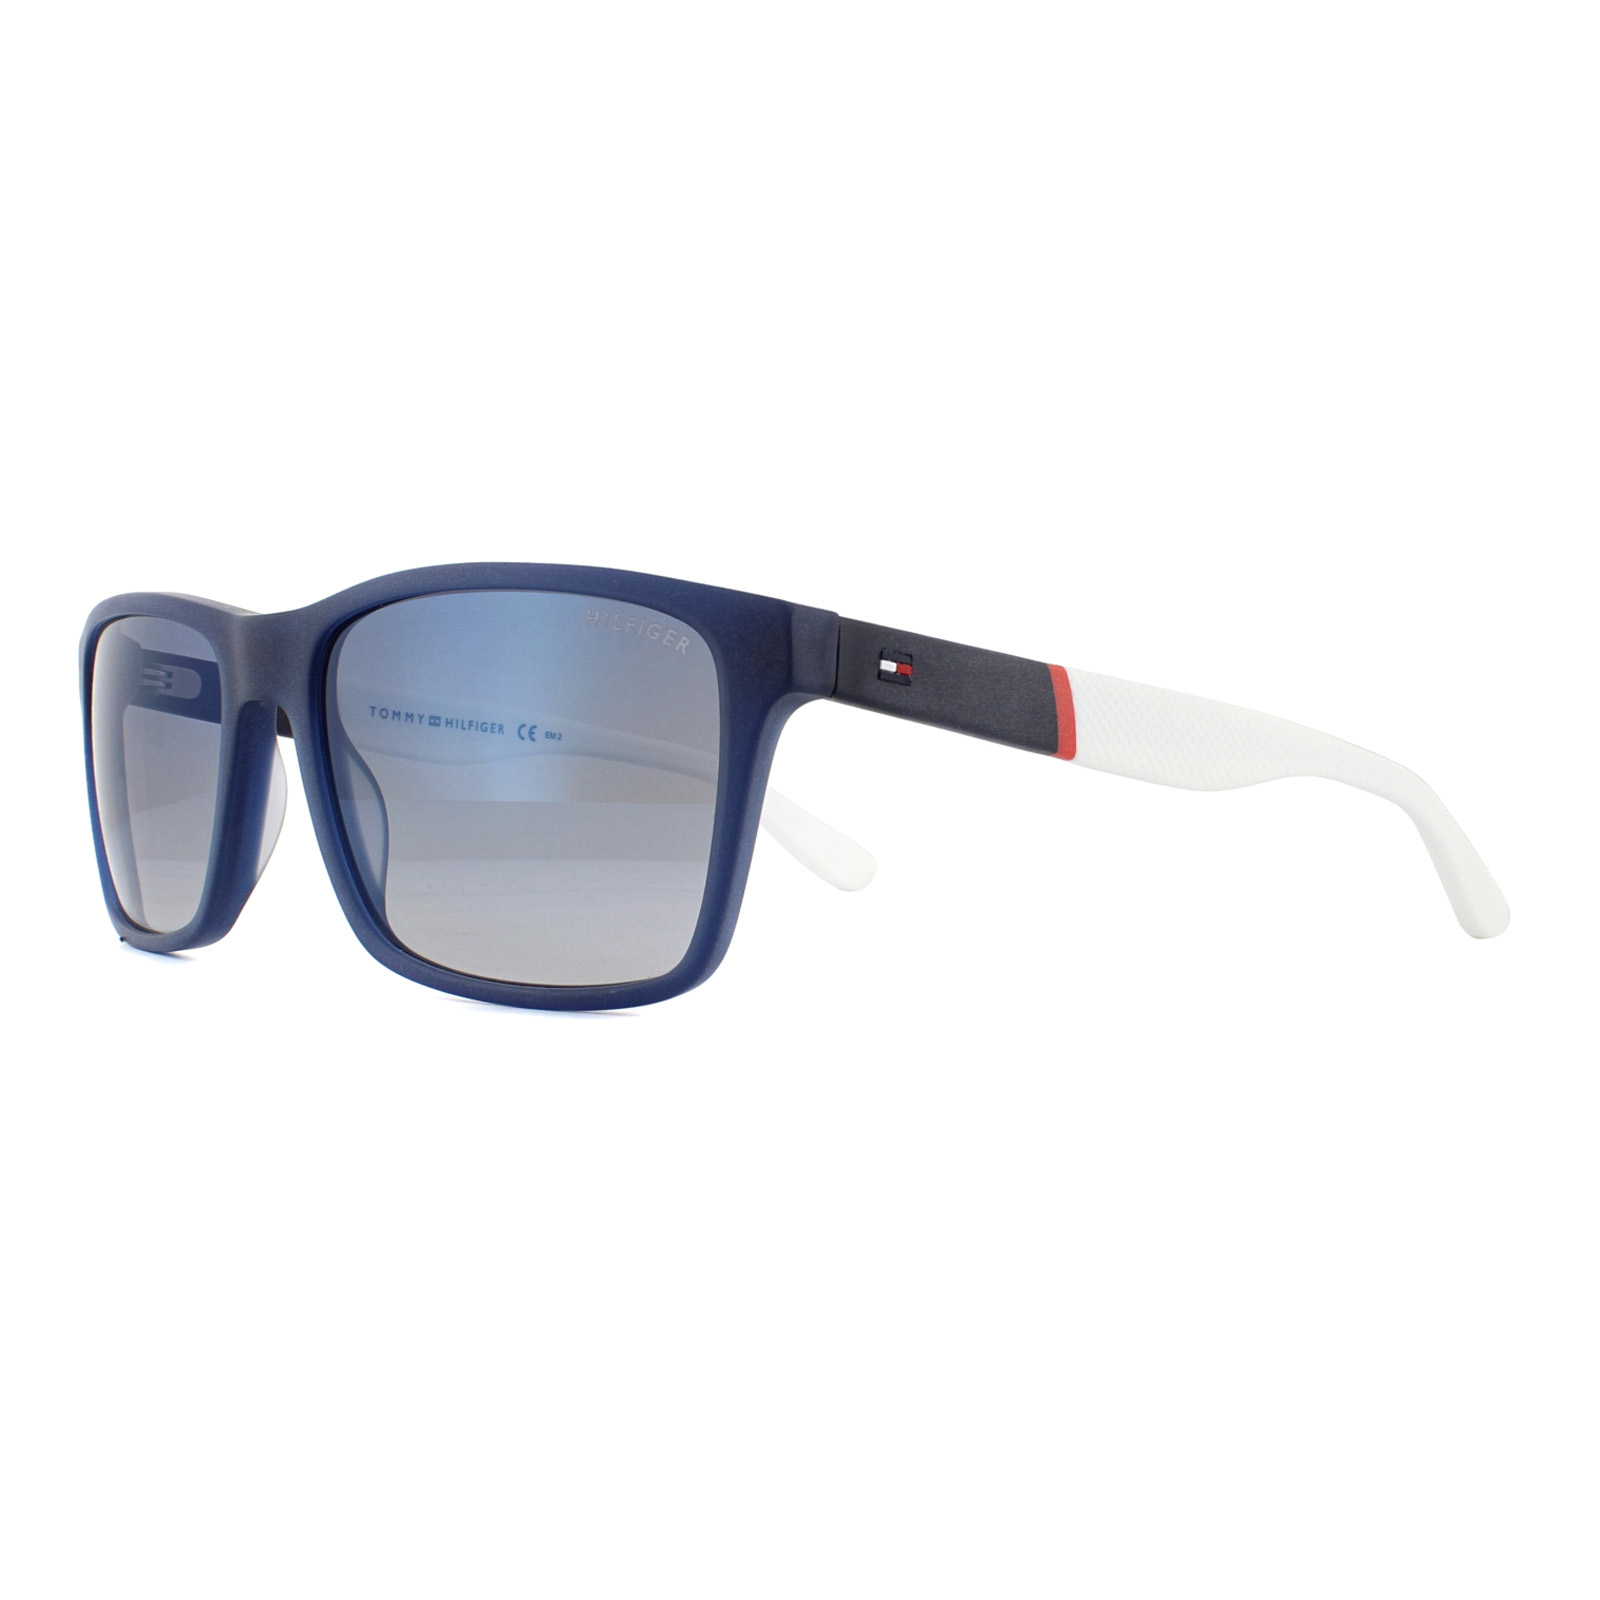 4b6245f140d0c Sentinel Tommy Hilfiger Sunglasses TH 1405 S H1O DK Blue Red White Light  Blue Sky Flash